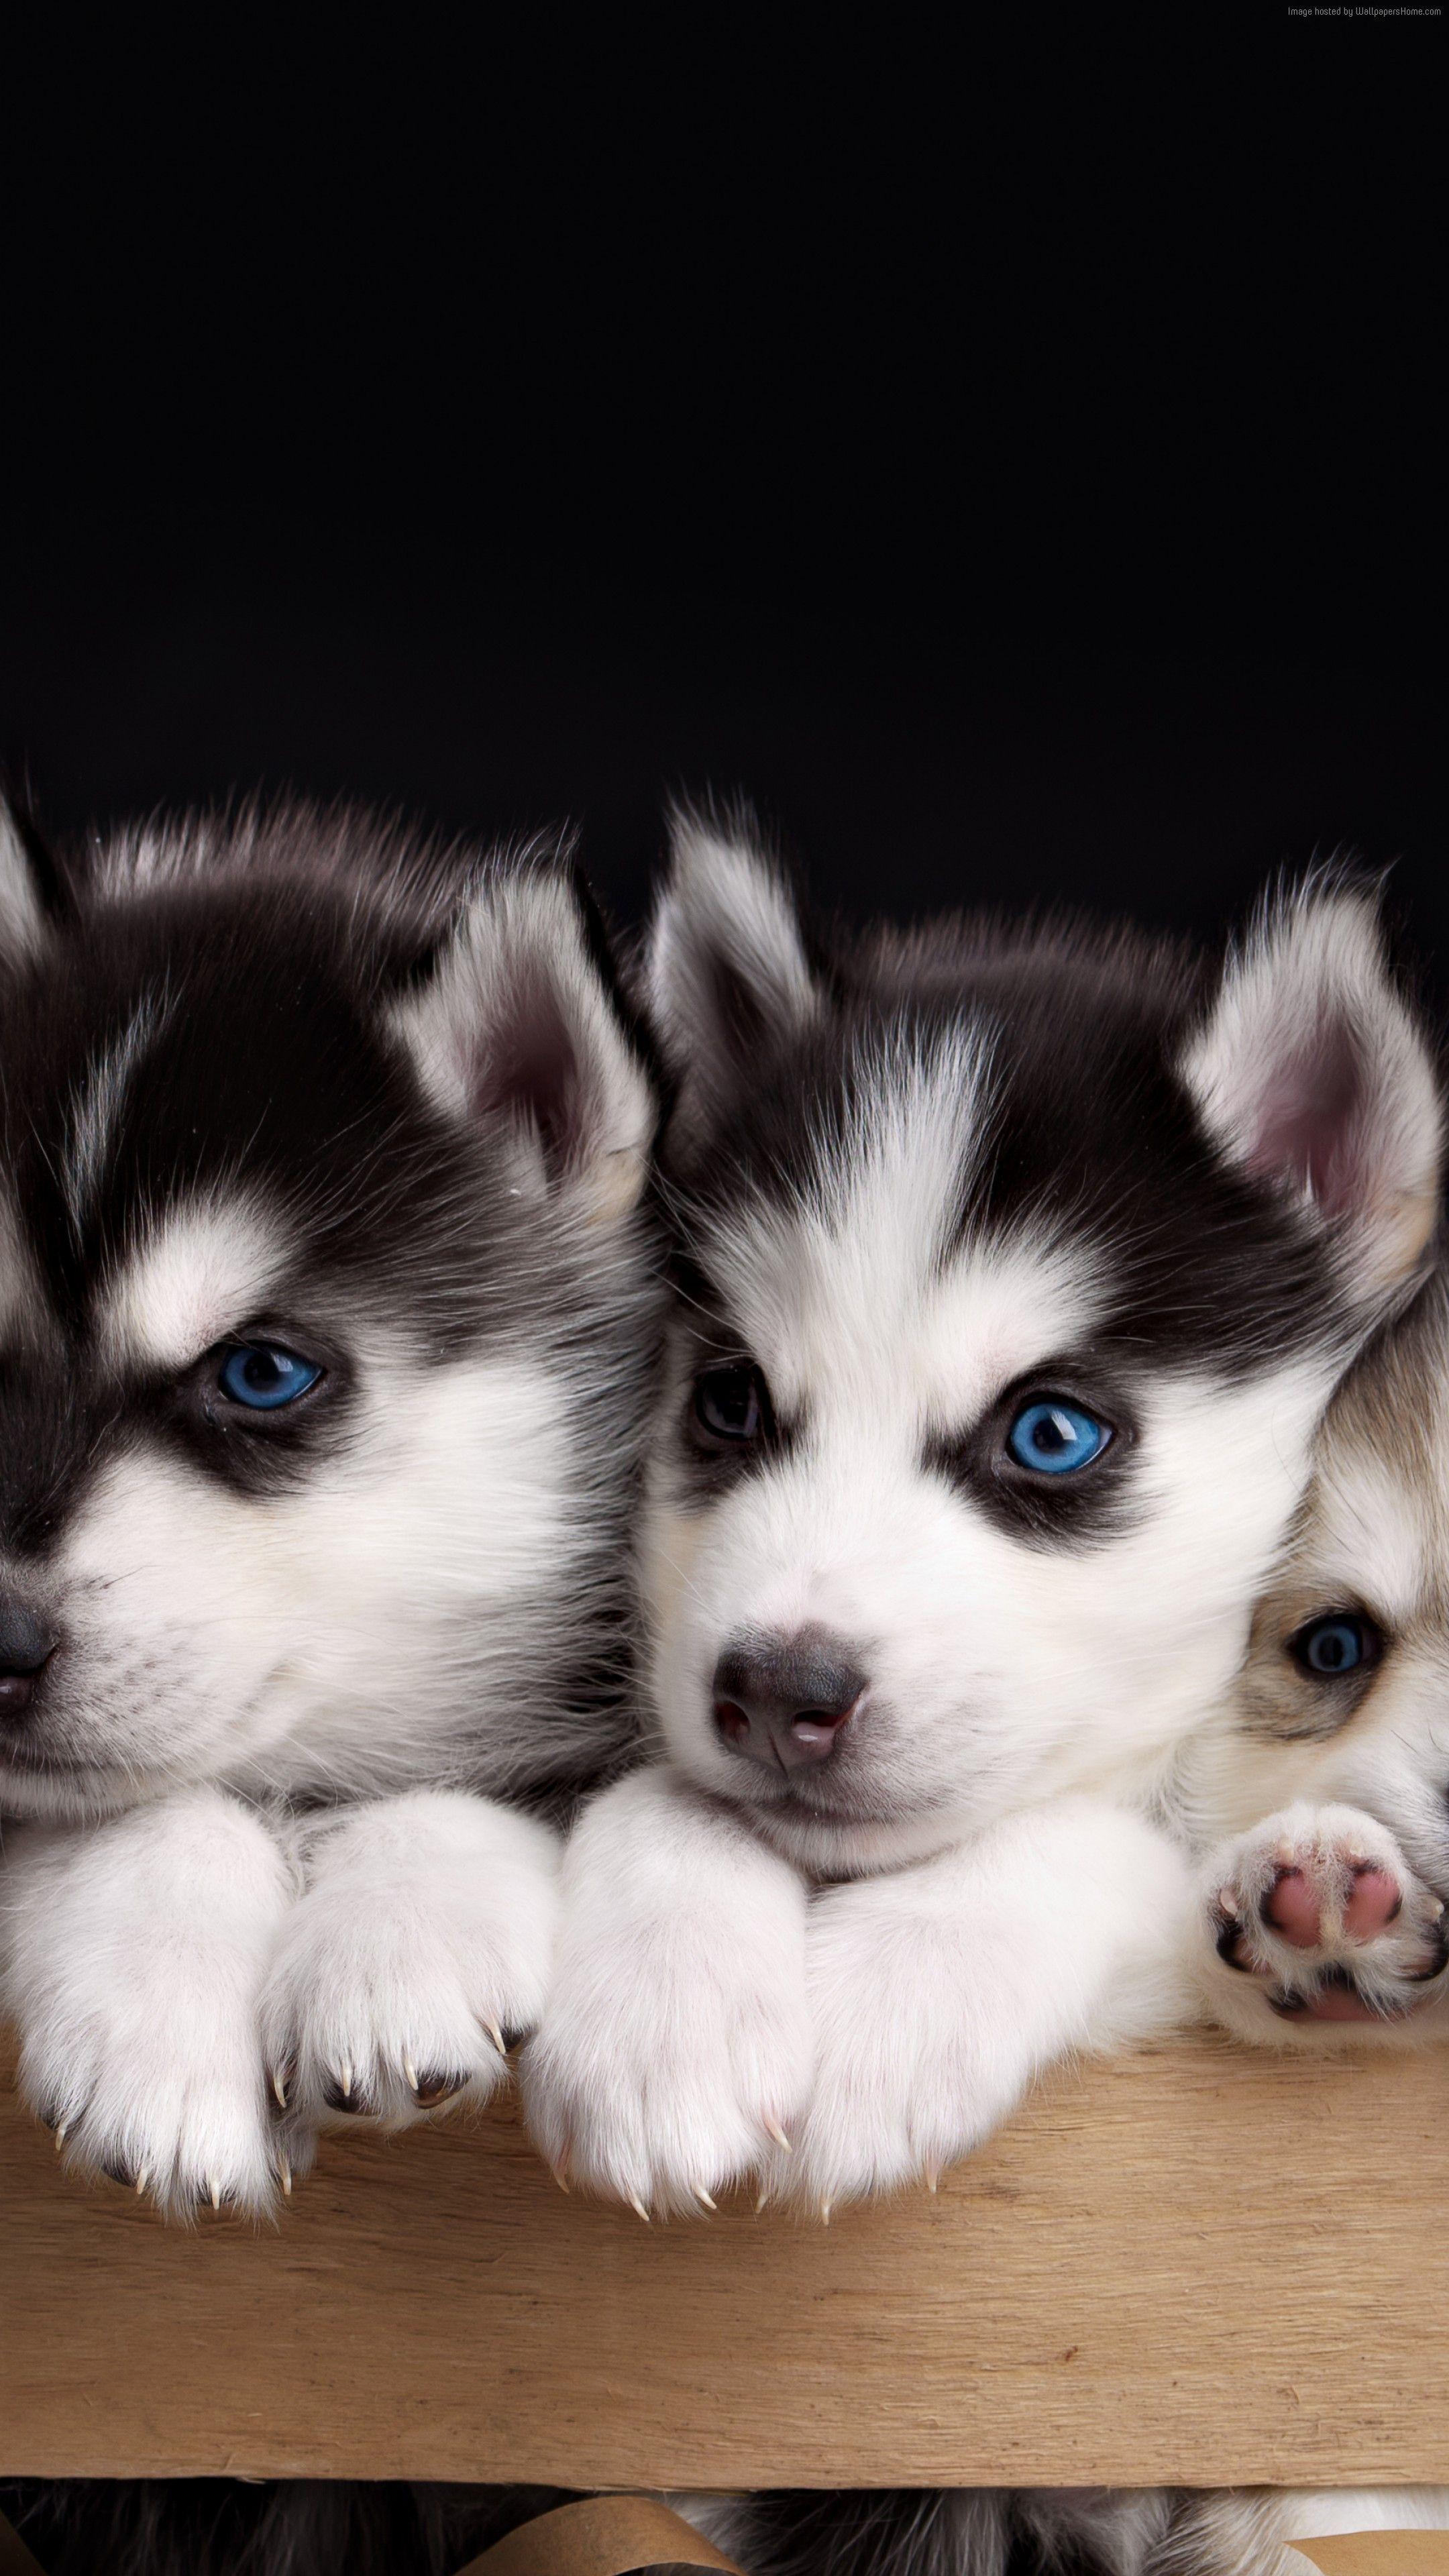 Wallpaper Husky 4k Cute Animals Puppy Cute Puppies Puppies